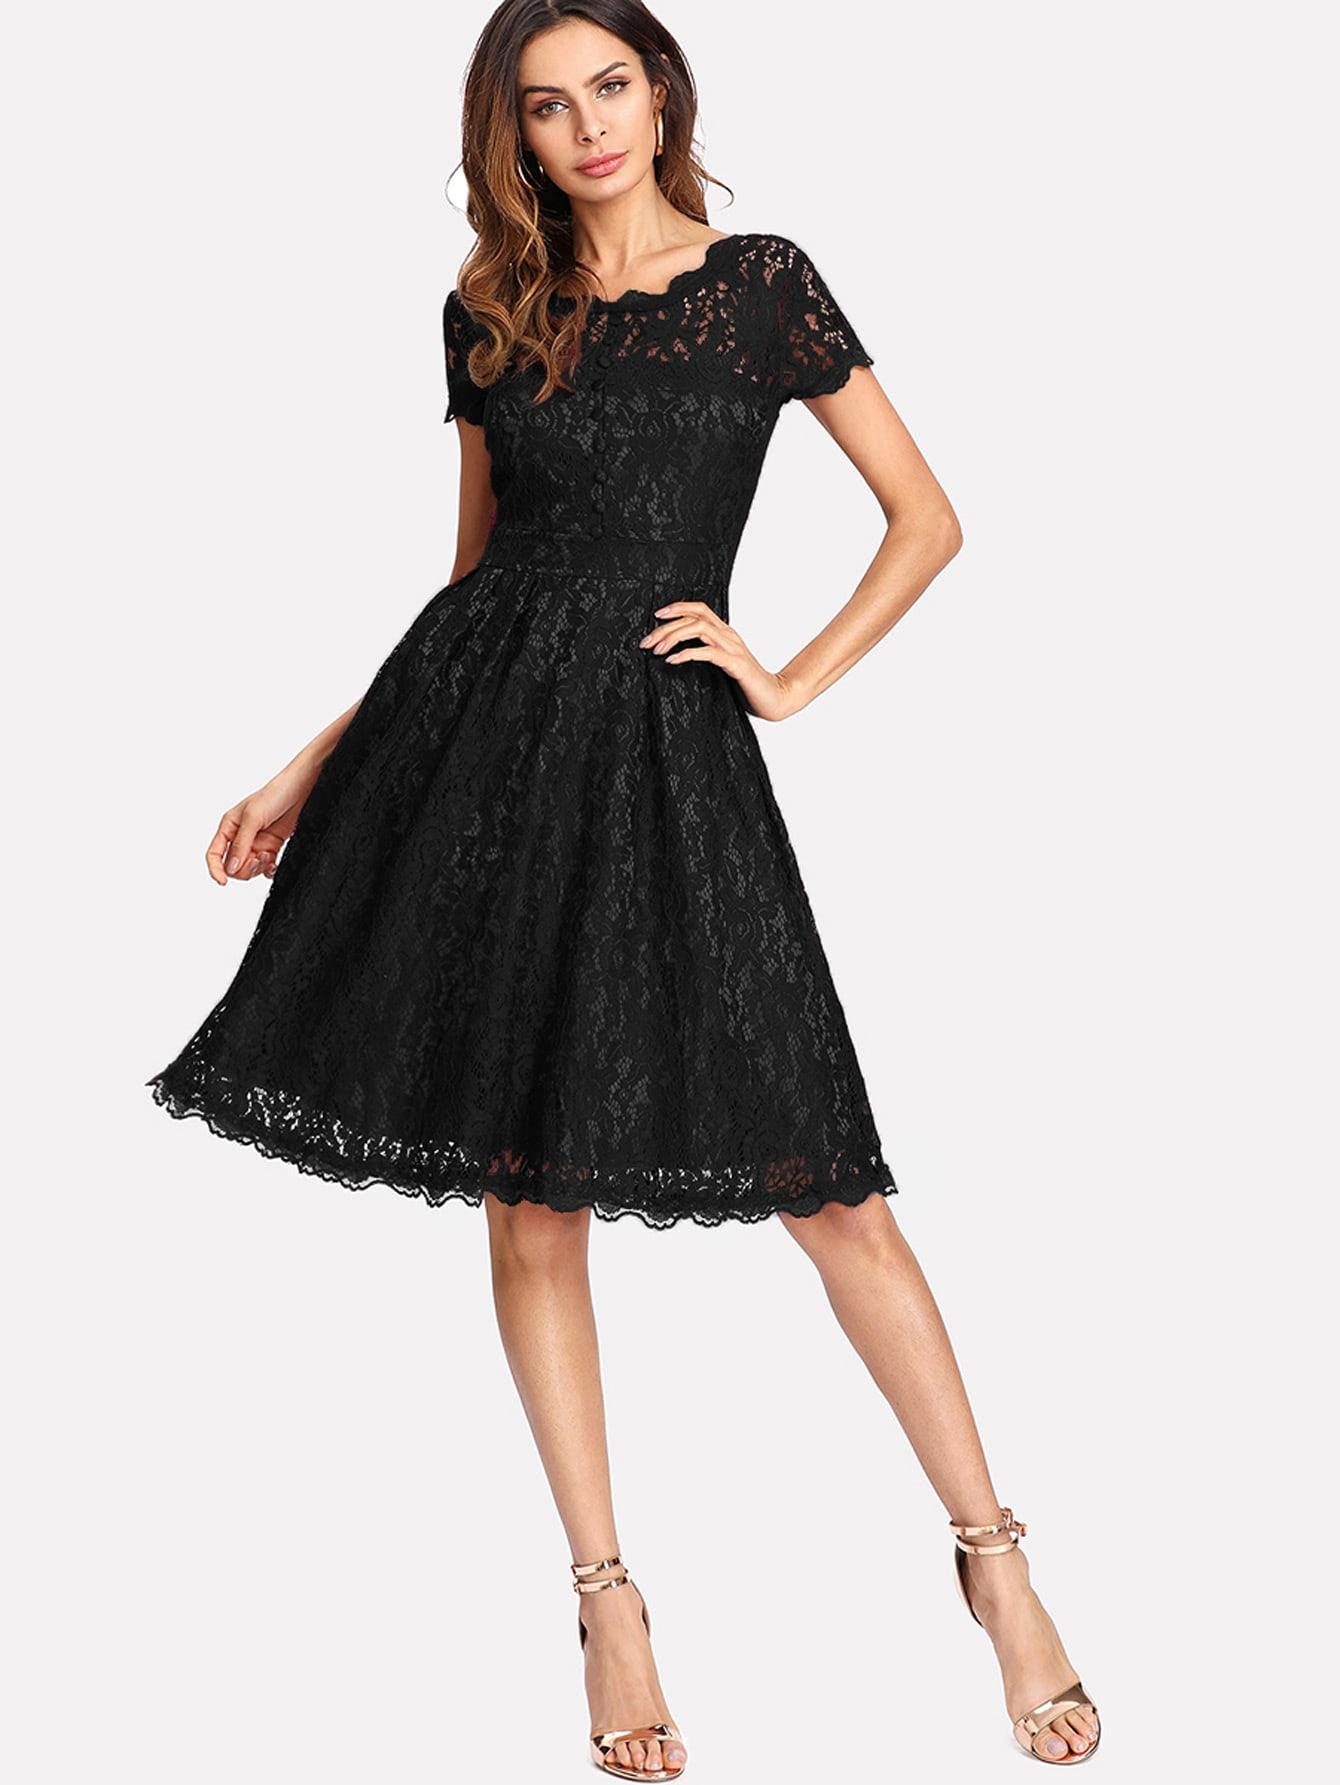 Hollow Out Lace Skater Dress hollow out plain courtly asymmetric neckline skater dress